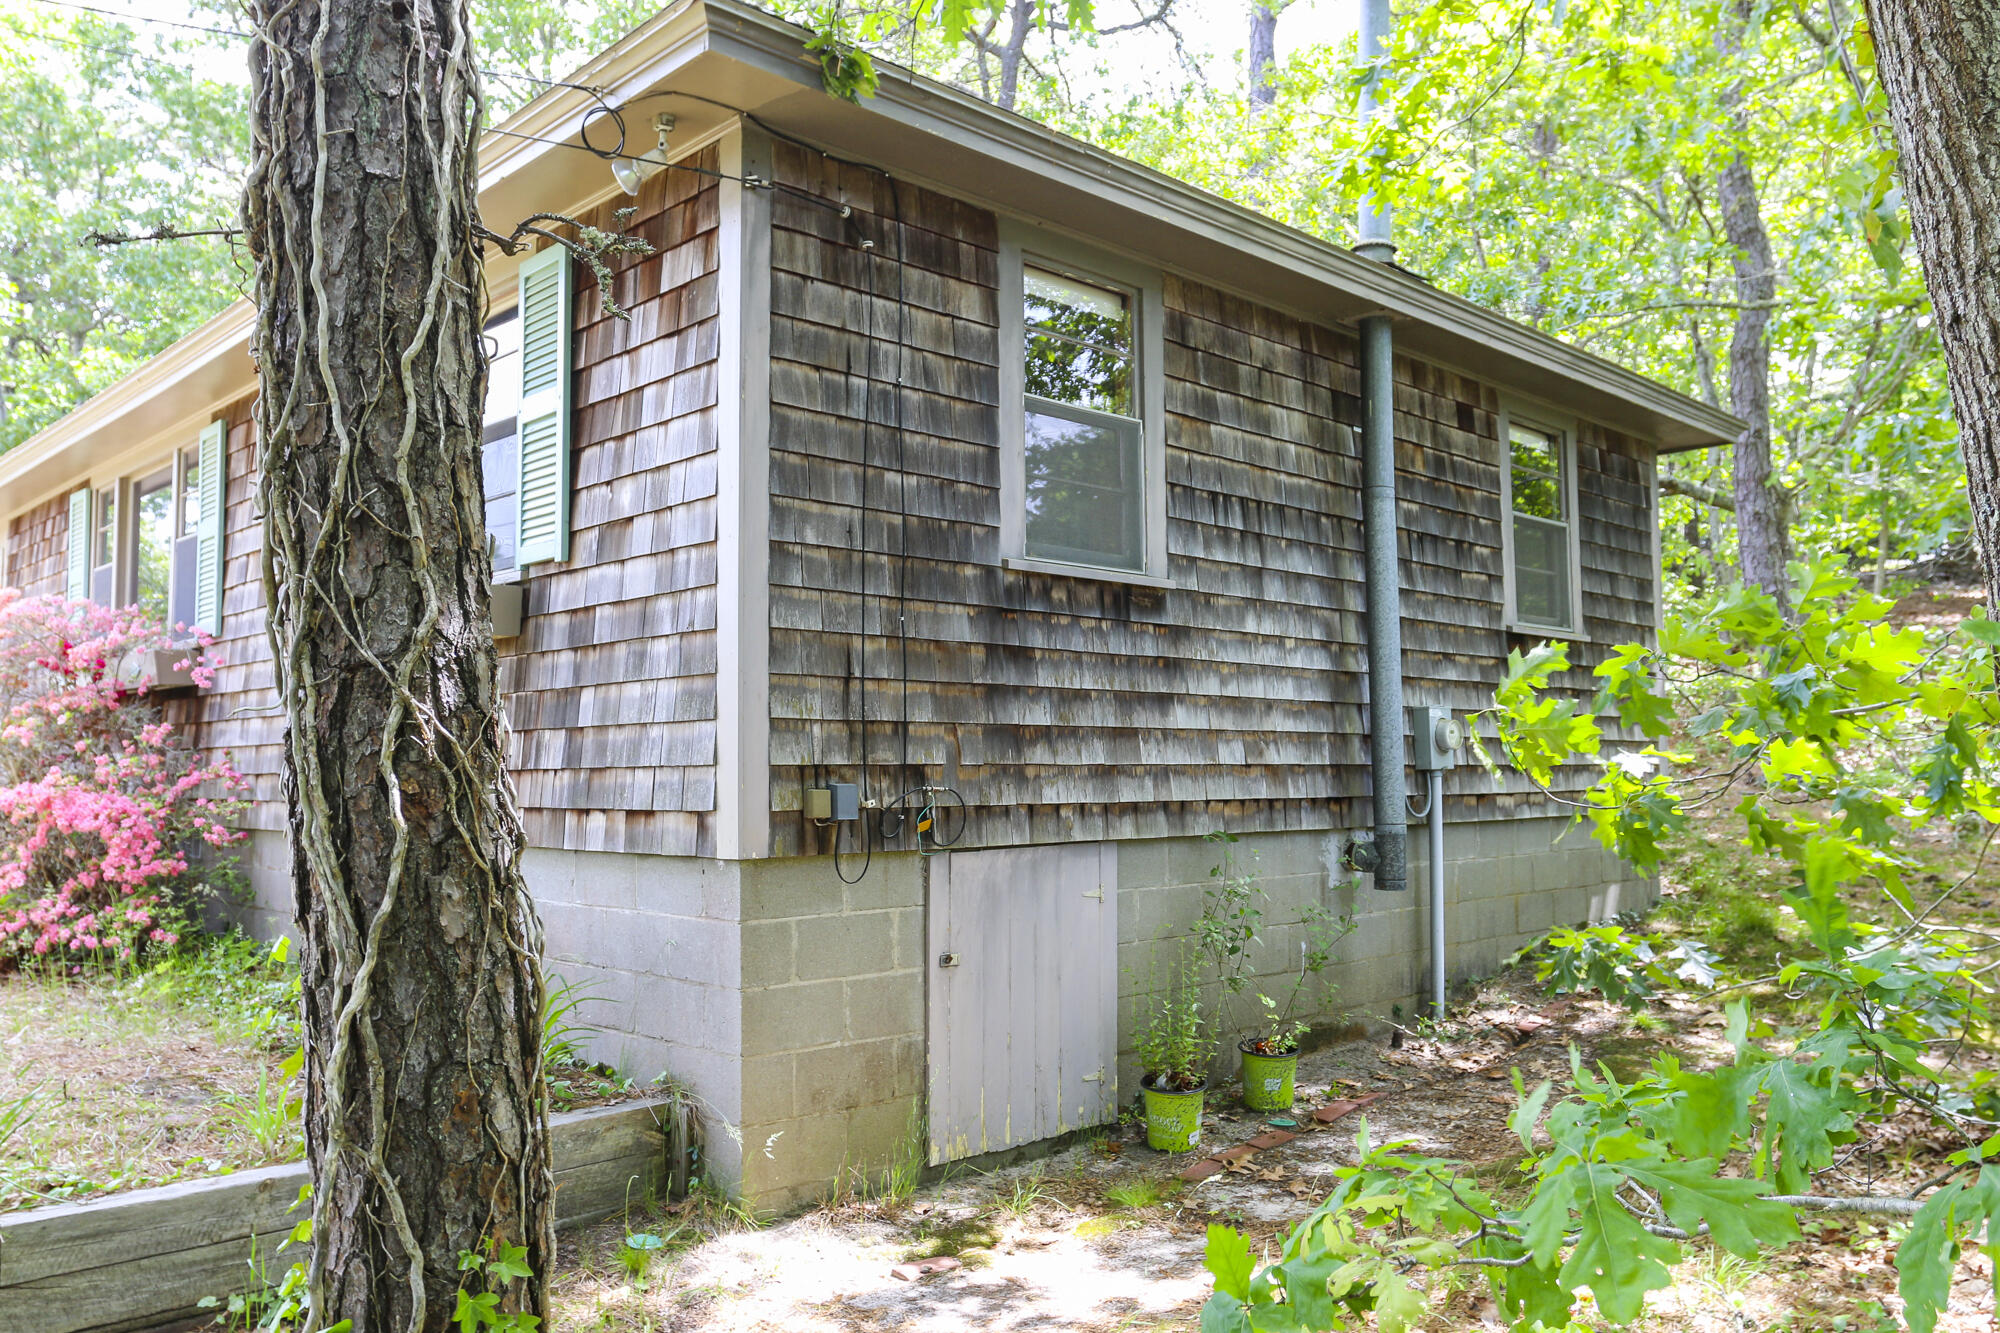 117 Bucks Creek Road, Chatham MA, 02633 - slide 5